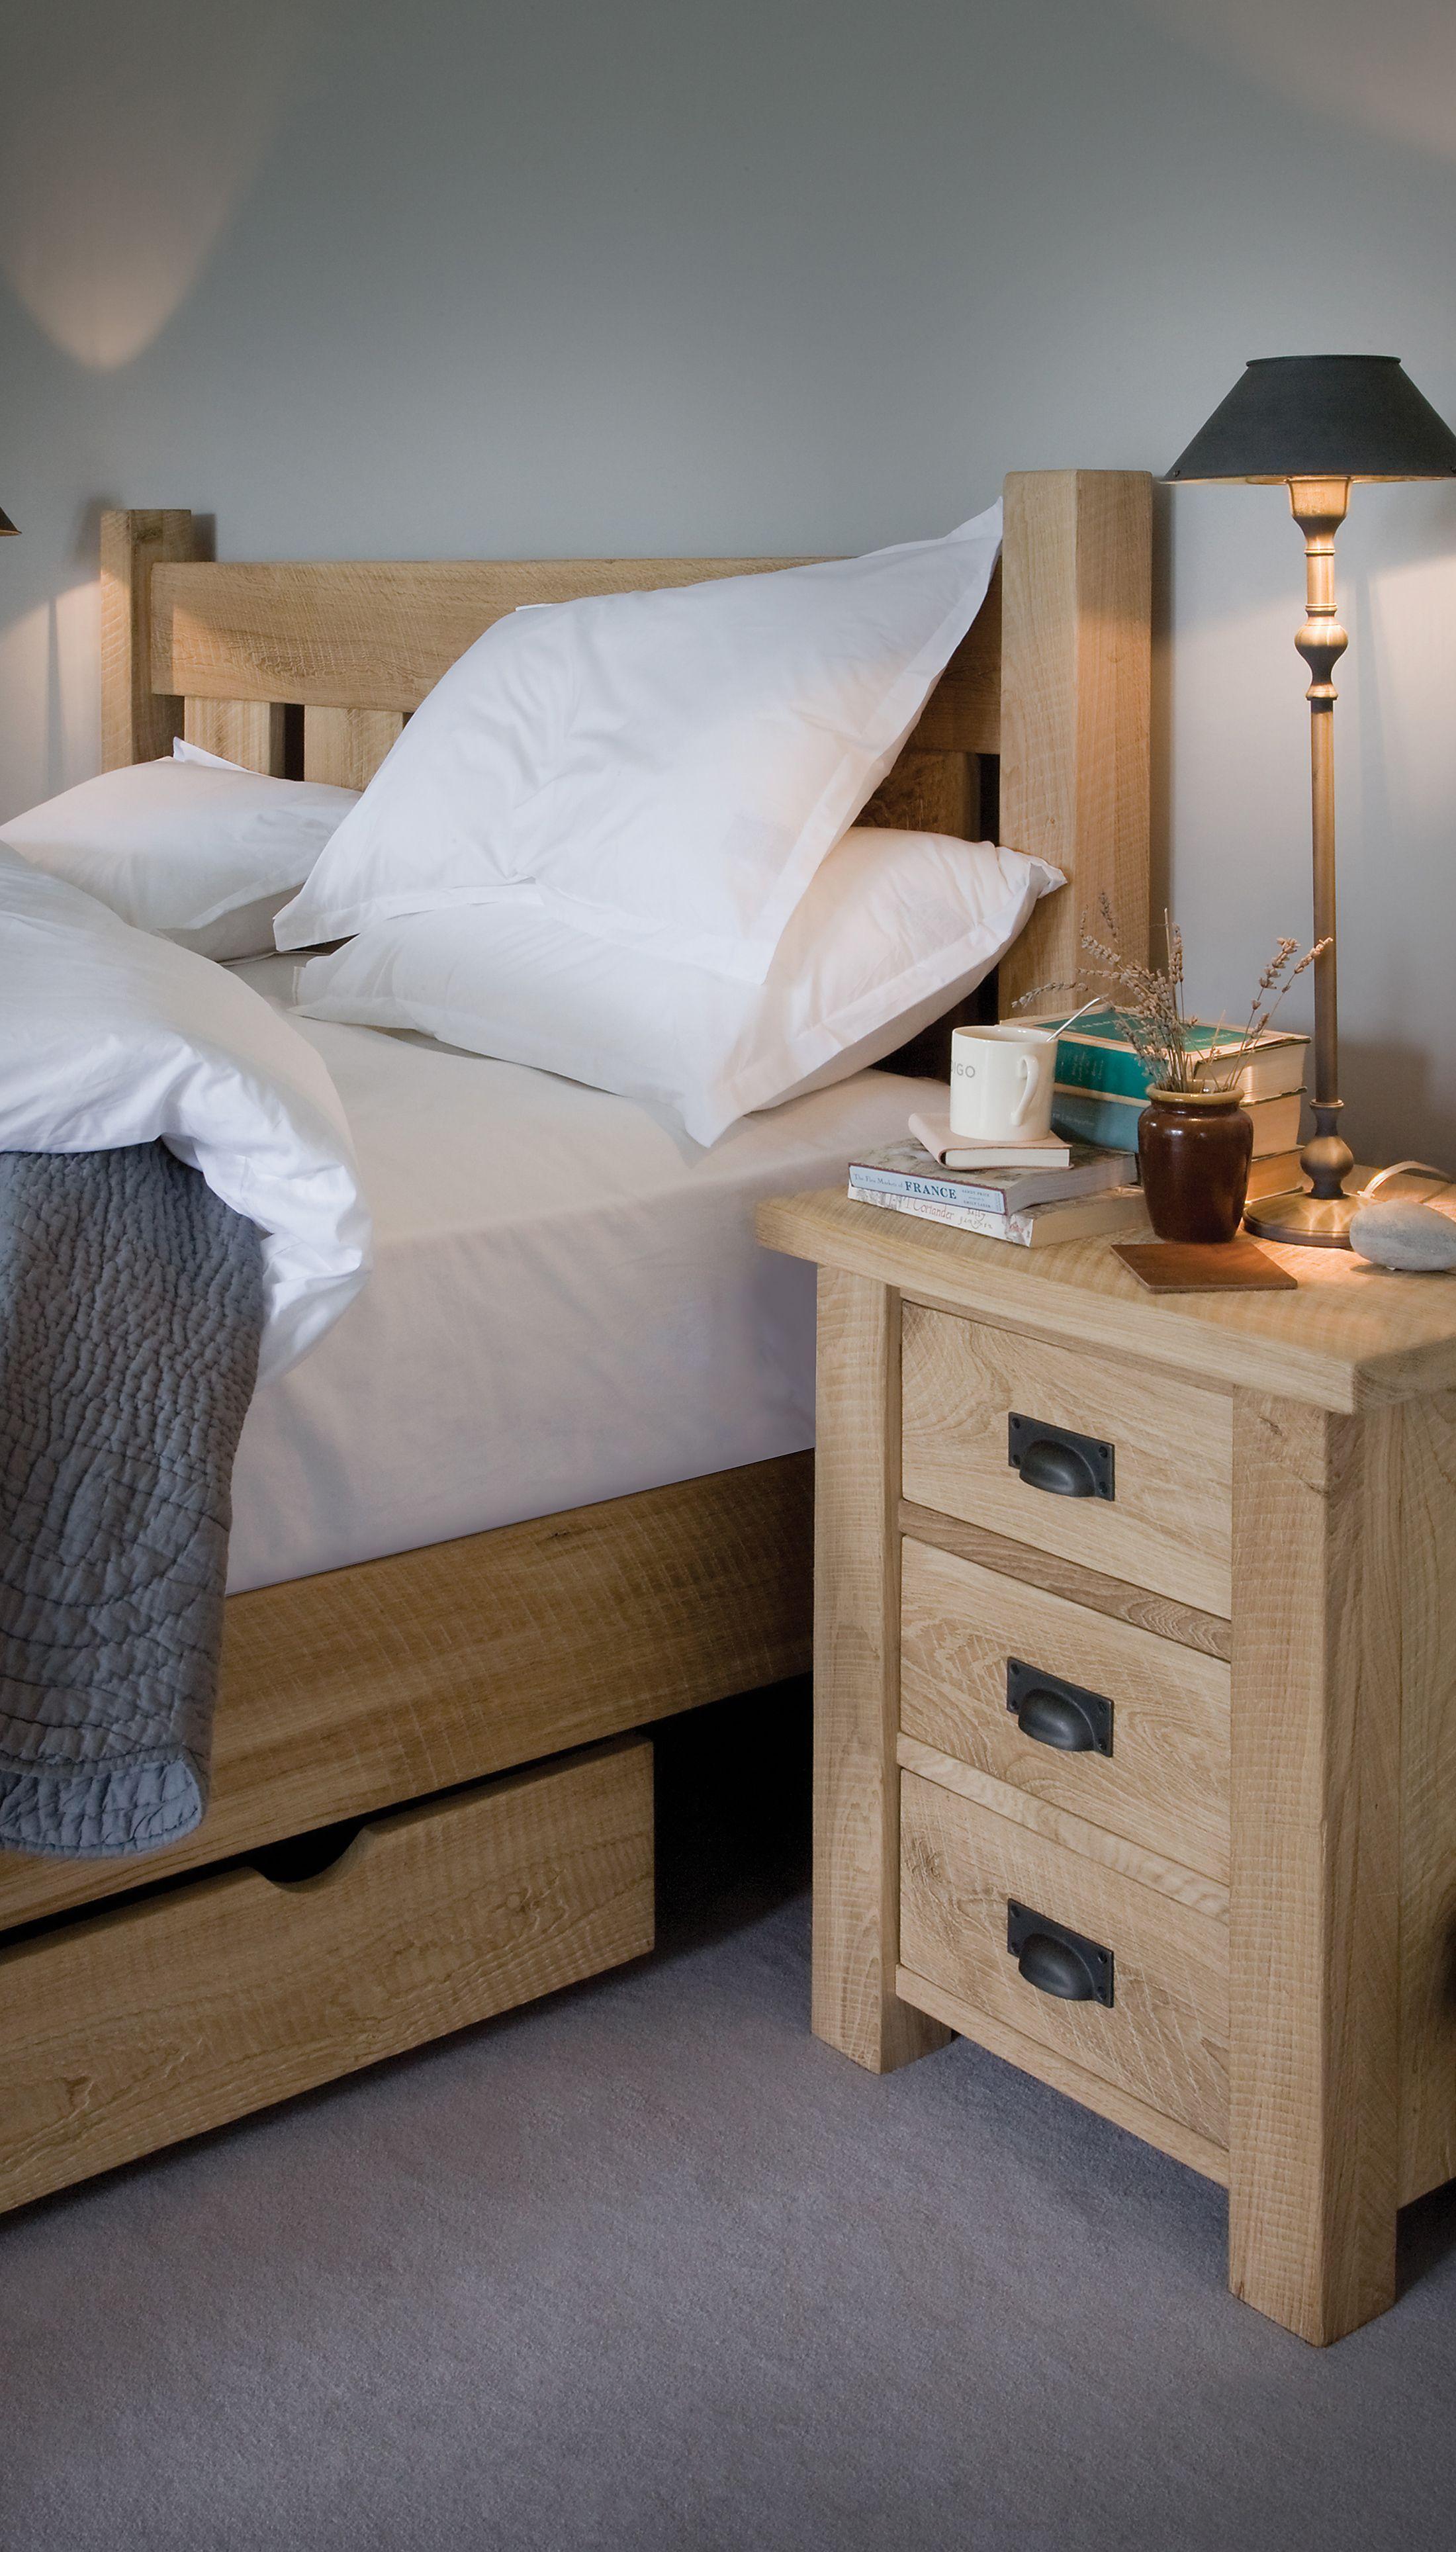 Oak Bedside Indigo Furniture Bedroom Duckegg Oak Oak Bedroom Furniture Oak Beds Oak Bedroom